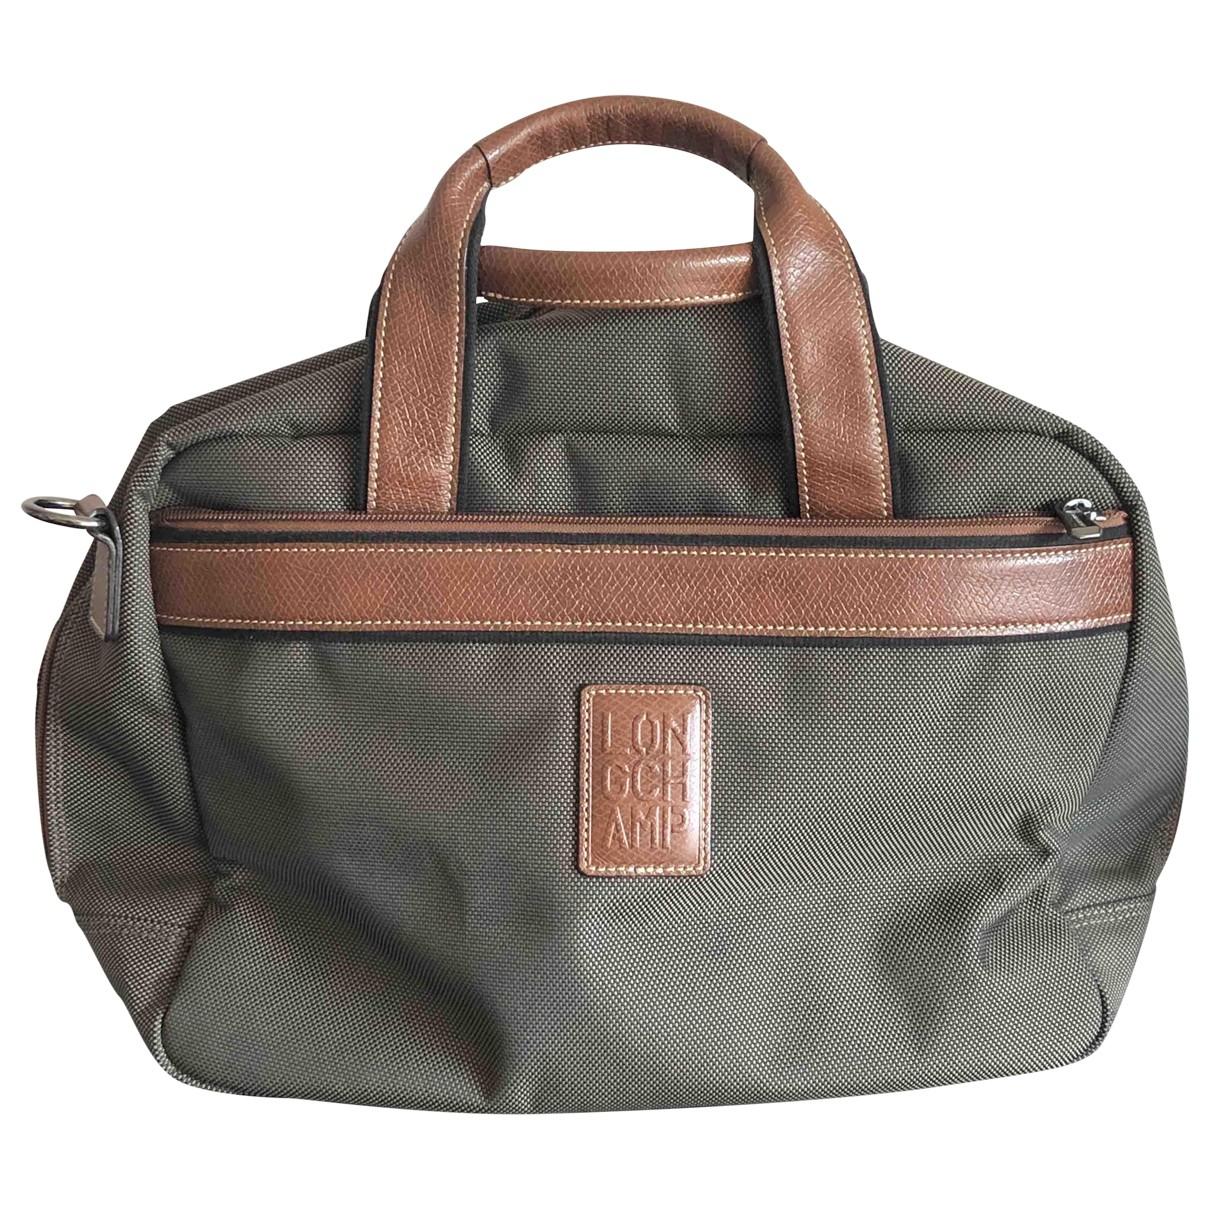 Longchamp - Sac de voyage   pour femme en toile - kaki